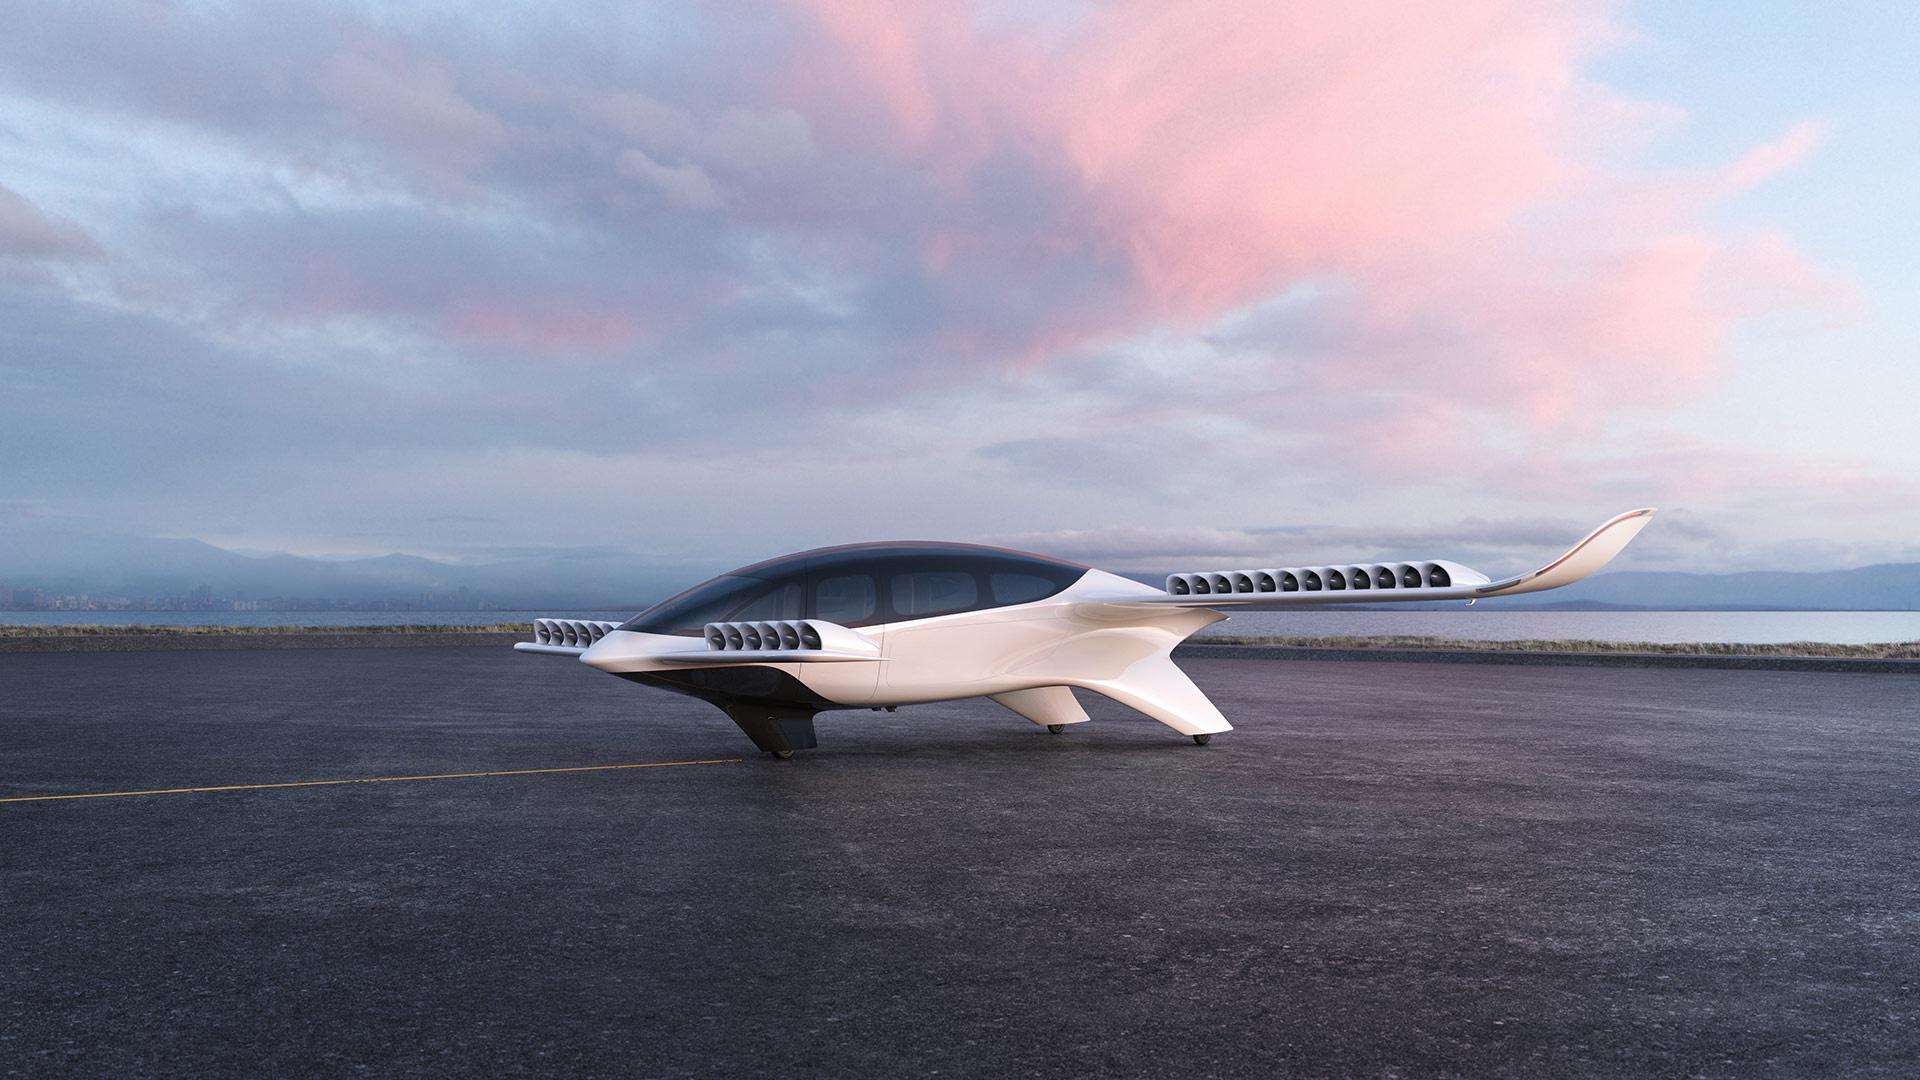 German Air Taxi Startup Lilium To List In $3.3 Billion SPAC Merger